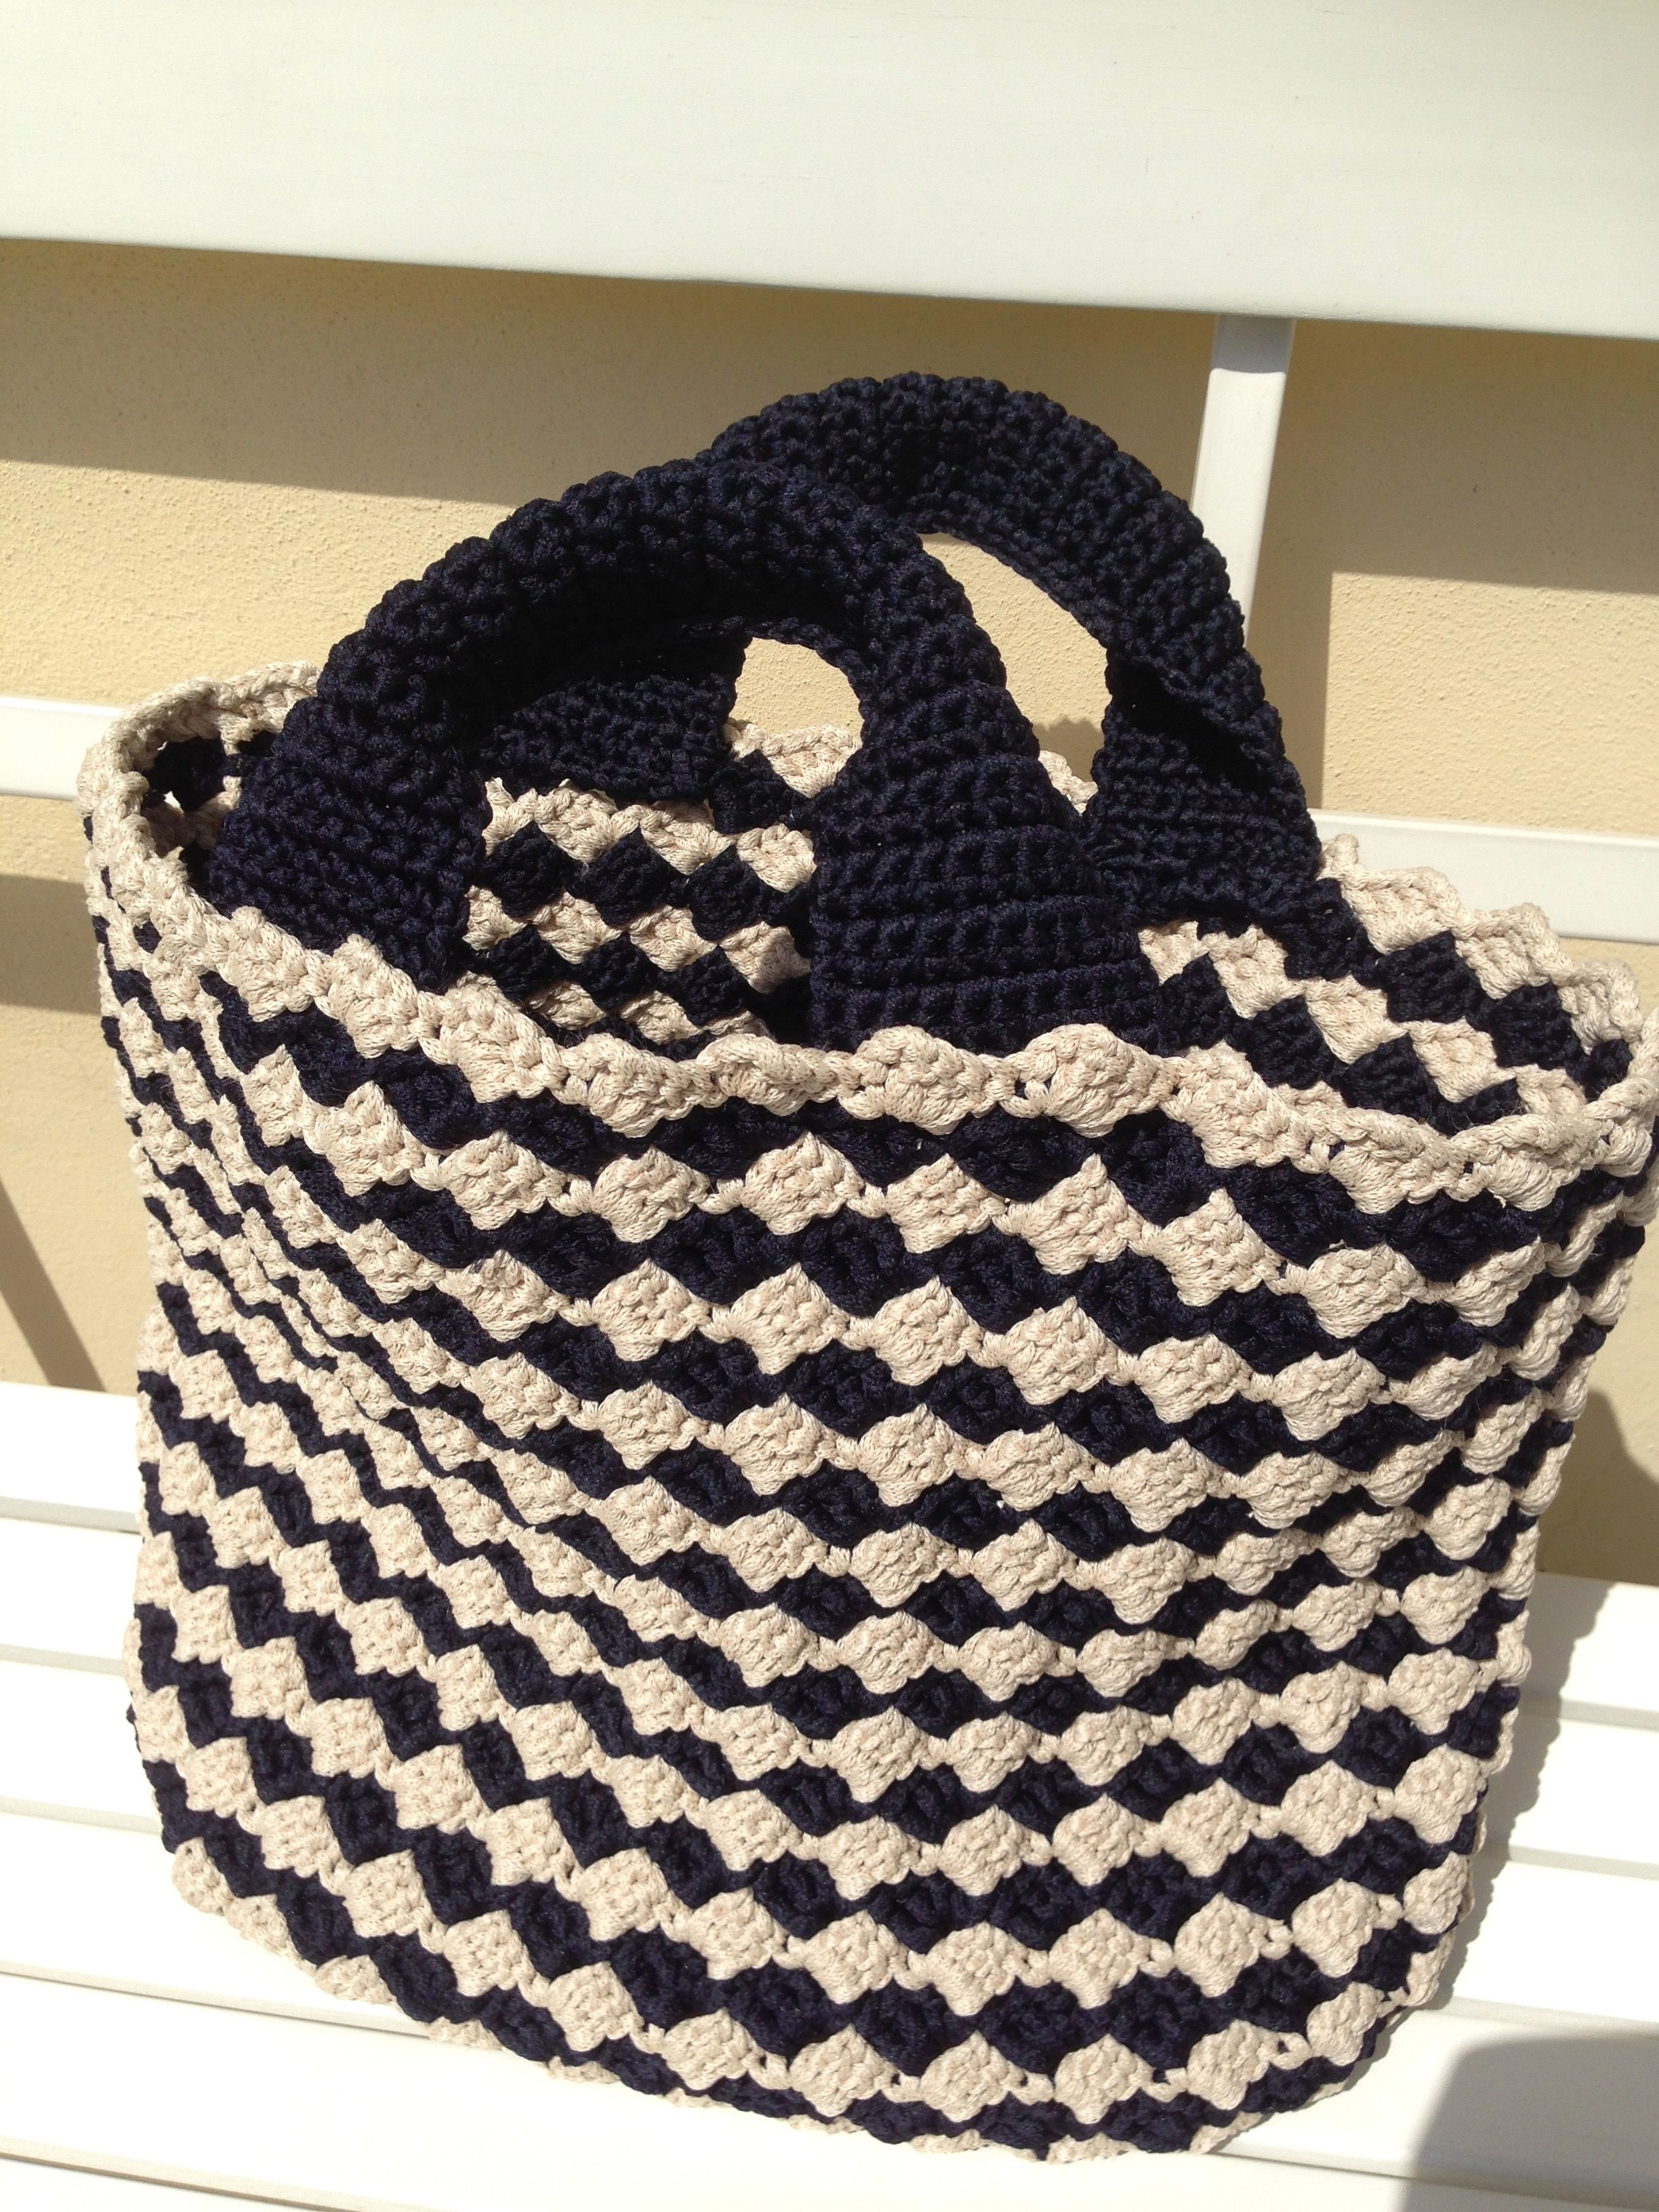 fb93c523e1ed Celebrity and Designer Crochet: June Roundup | crochet | Bolsos de  Ganchillo, Bolsos, Bolsos cartera